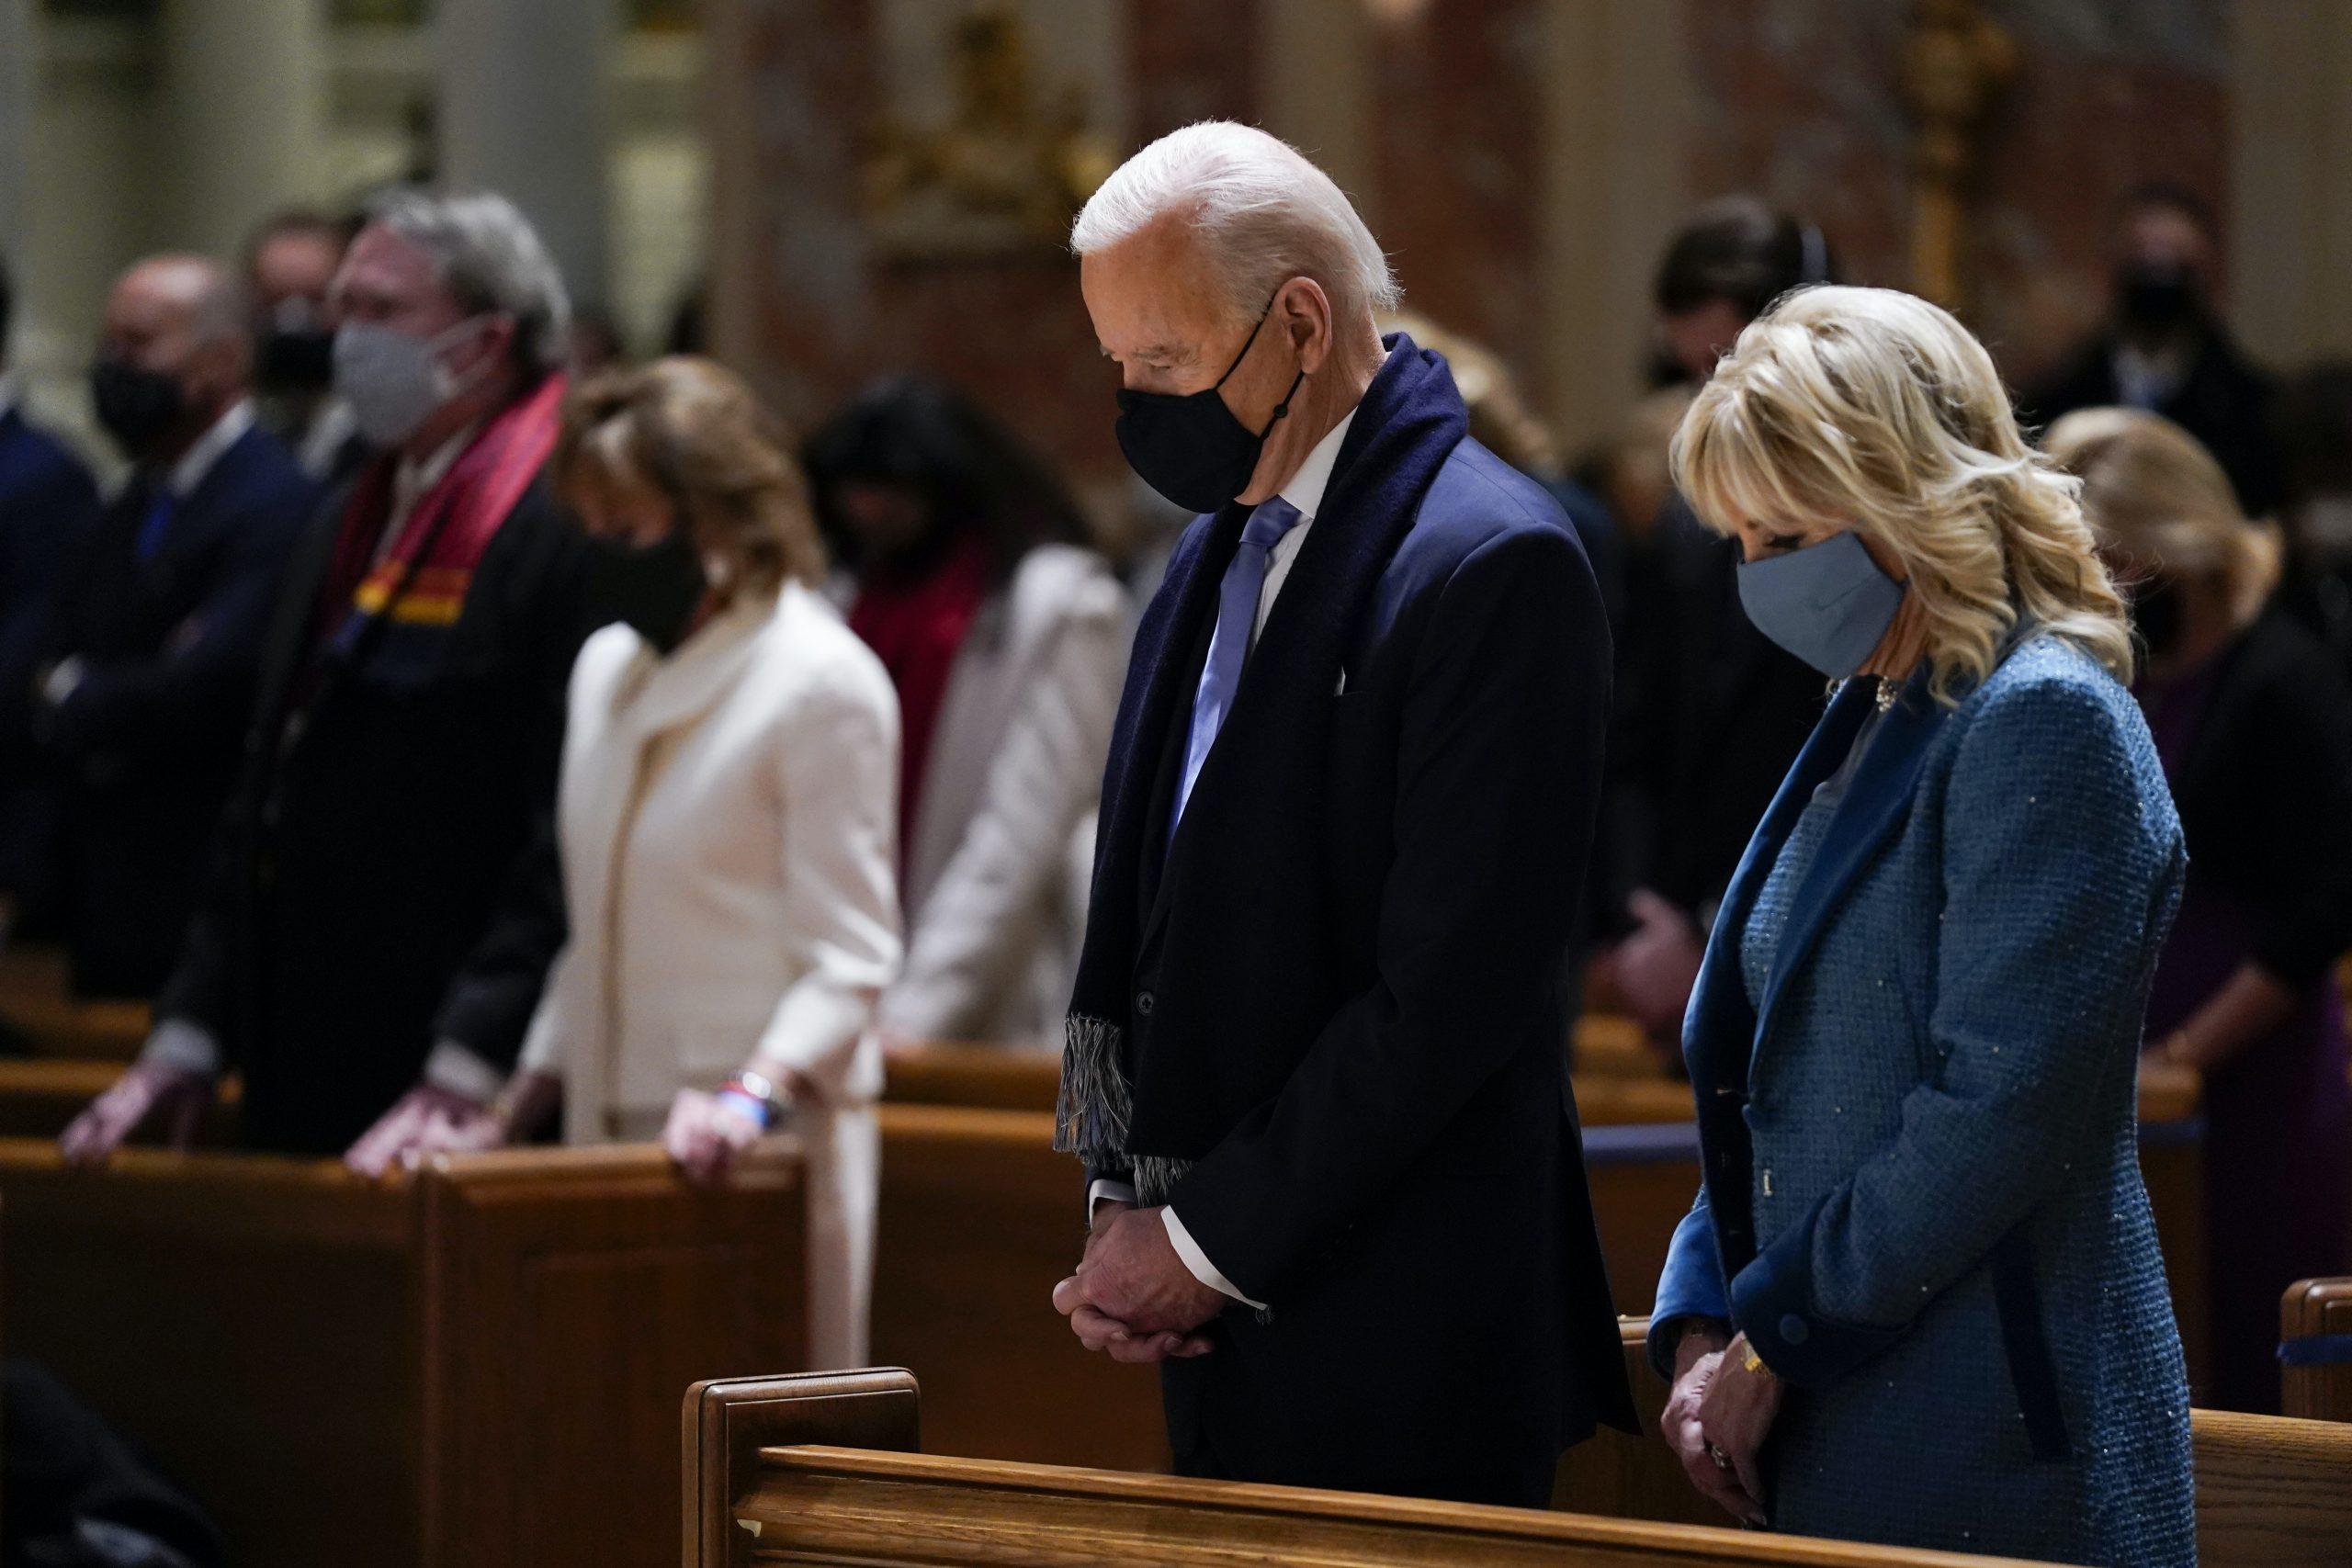 President Joe Biden's progressive values jar with the conservatism of some Catholic bishops. (AP Photo/Evan Vucci)